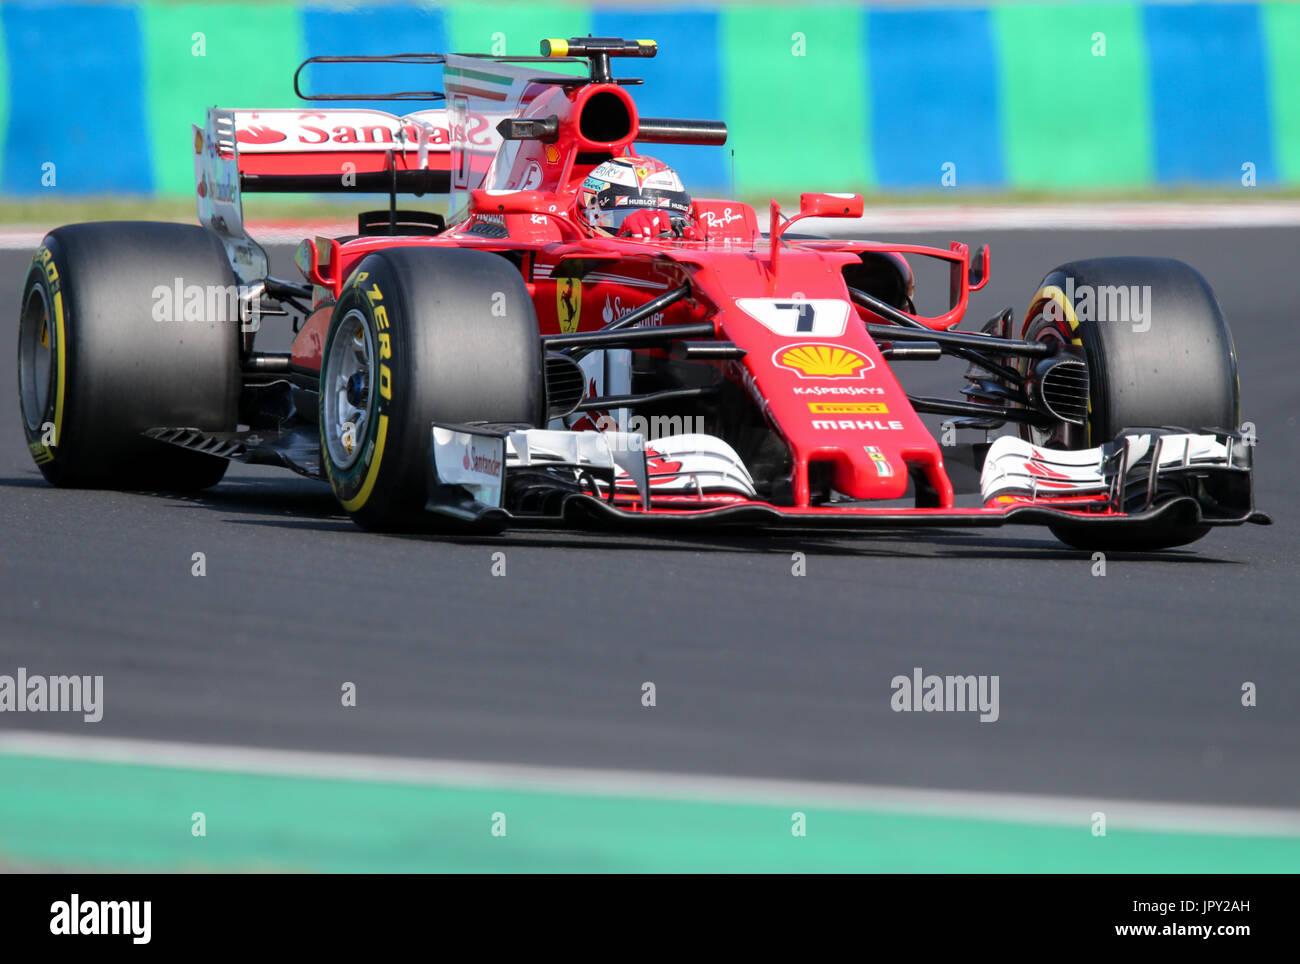 Budapest, Ungarn. 2. August 2017. 2. August 2017, Hungaroring, Budapest, Ungarn; Formel 1 In Saison-Test; Kimi Räikkönen Stockbild